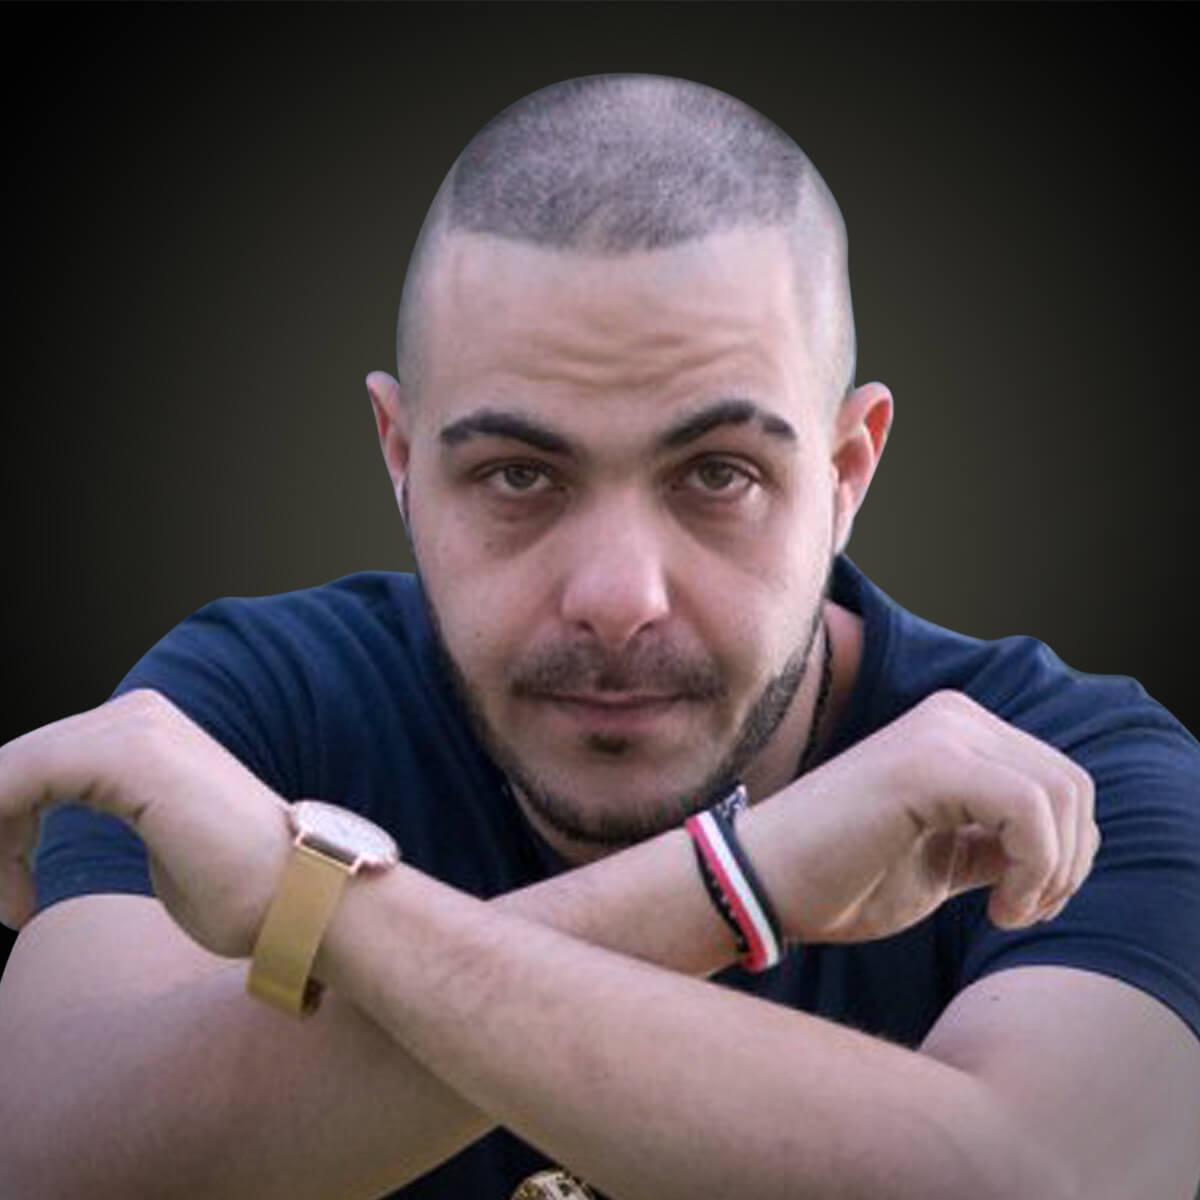 abyusif arab singer